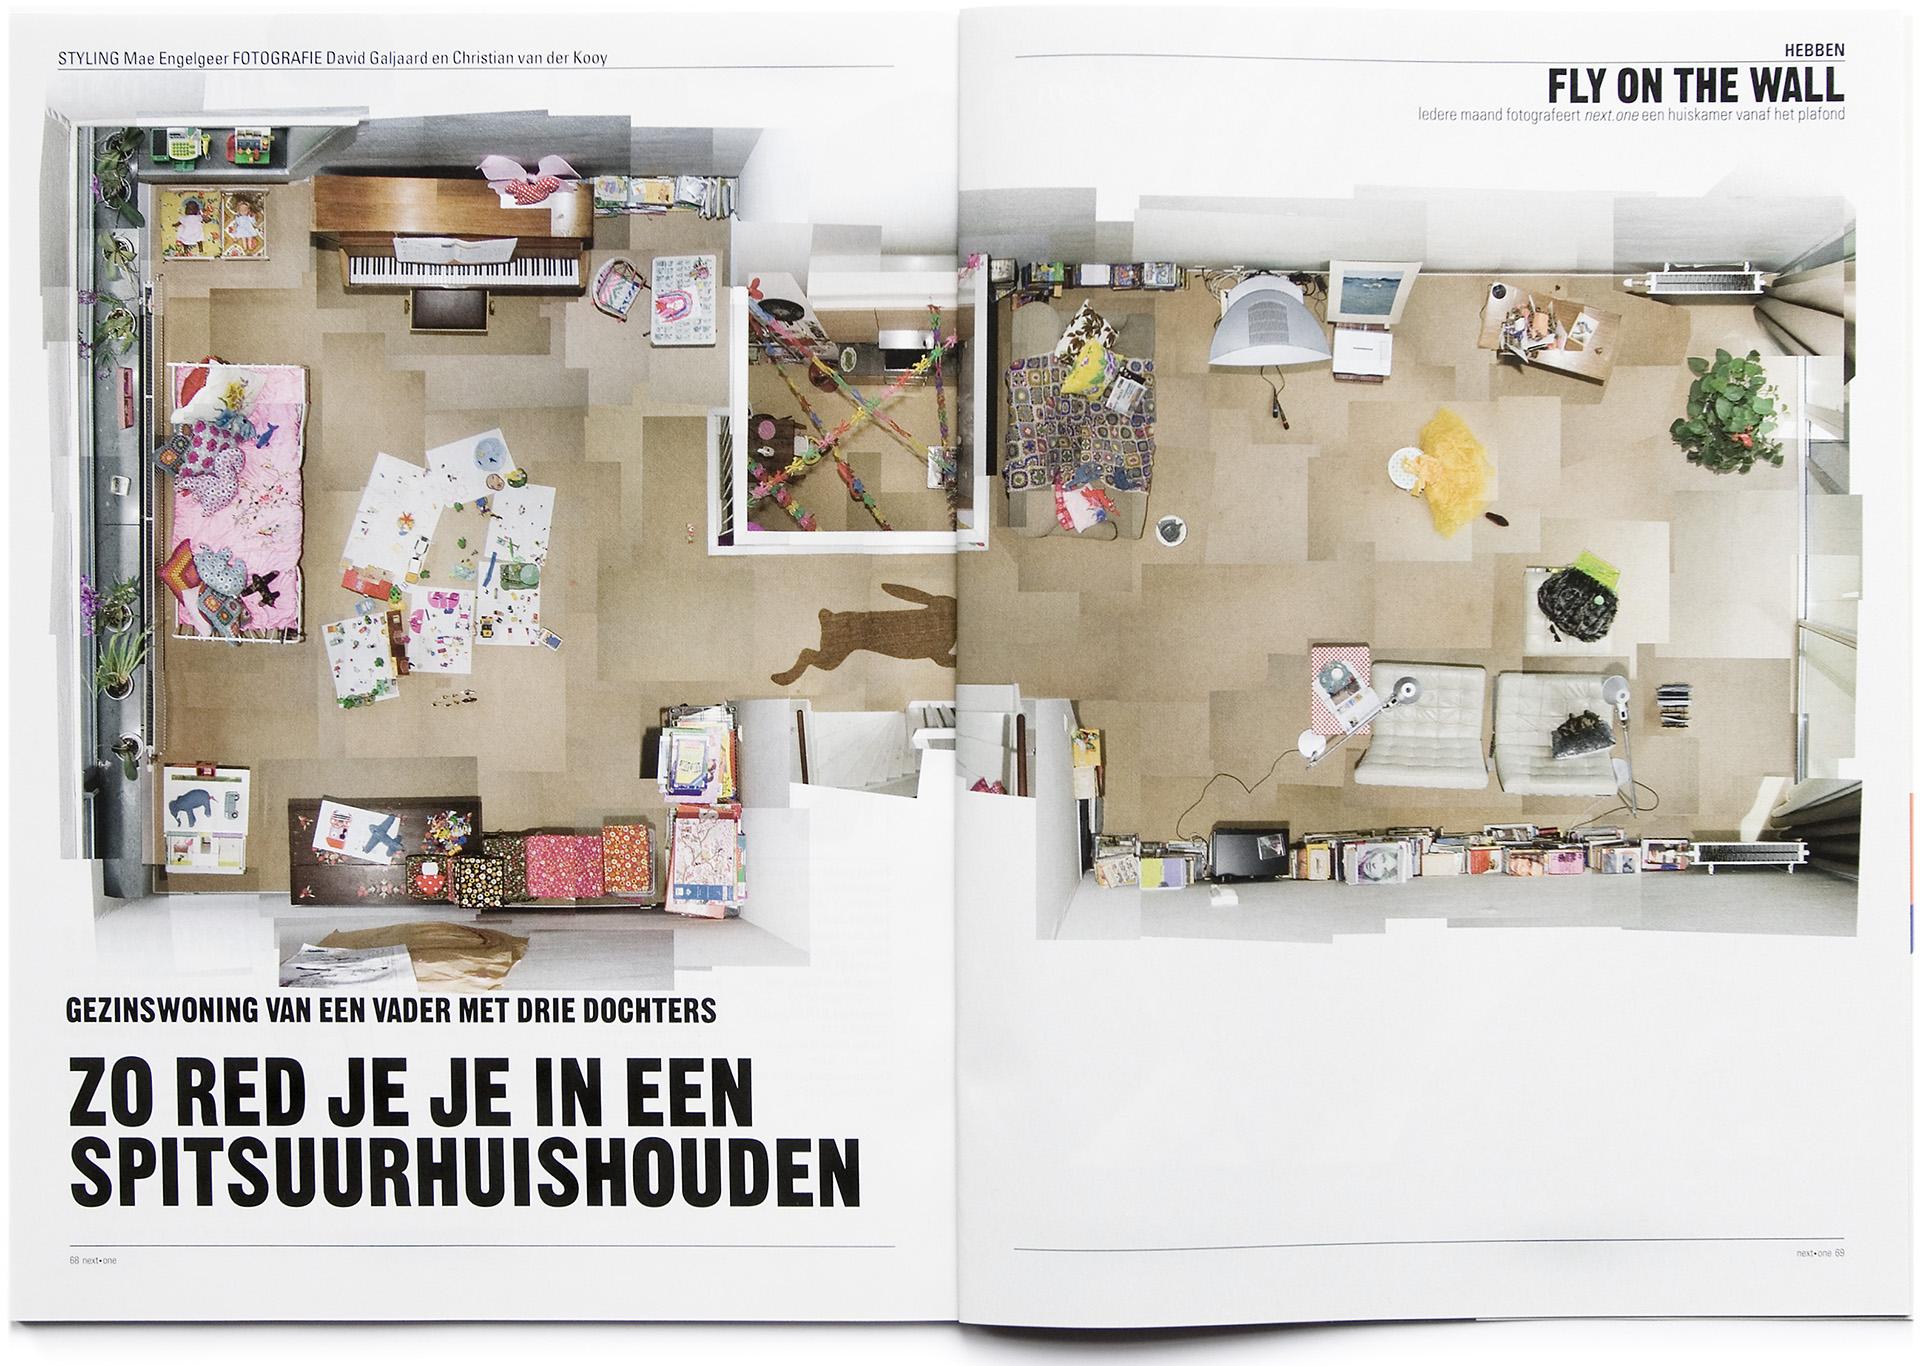 NRC One - Fly on the wall - 2008 - David Galjaard